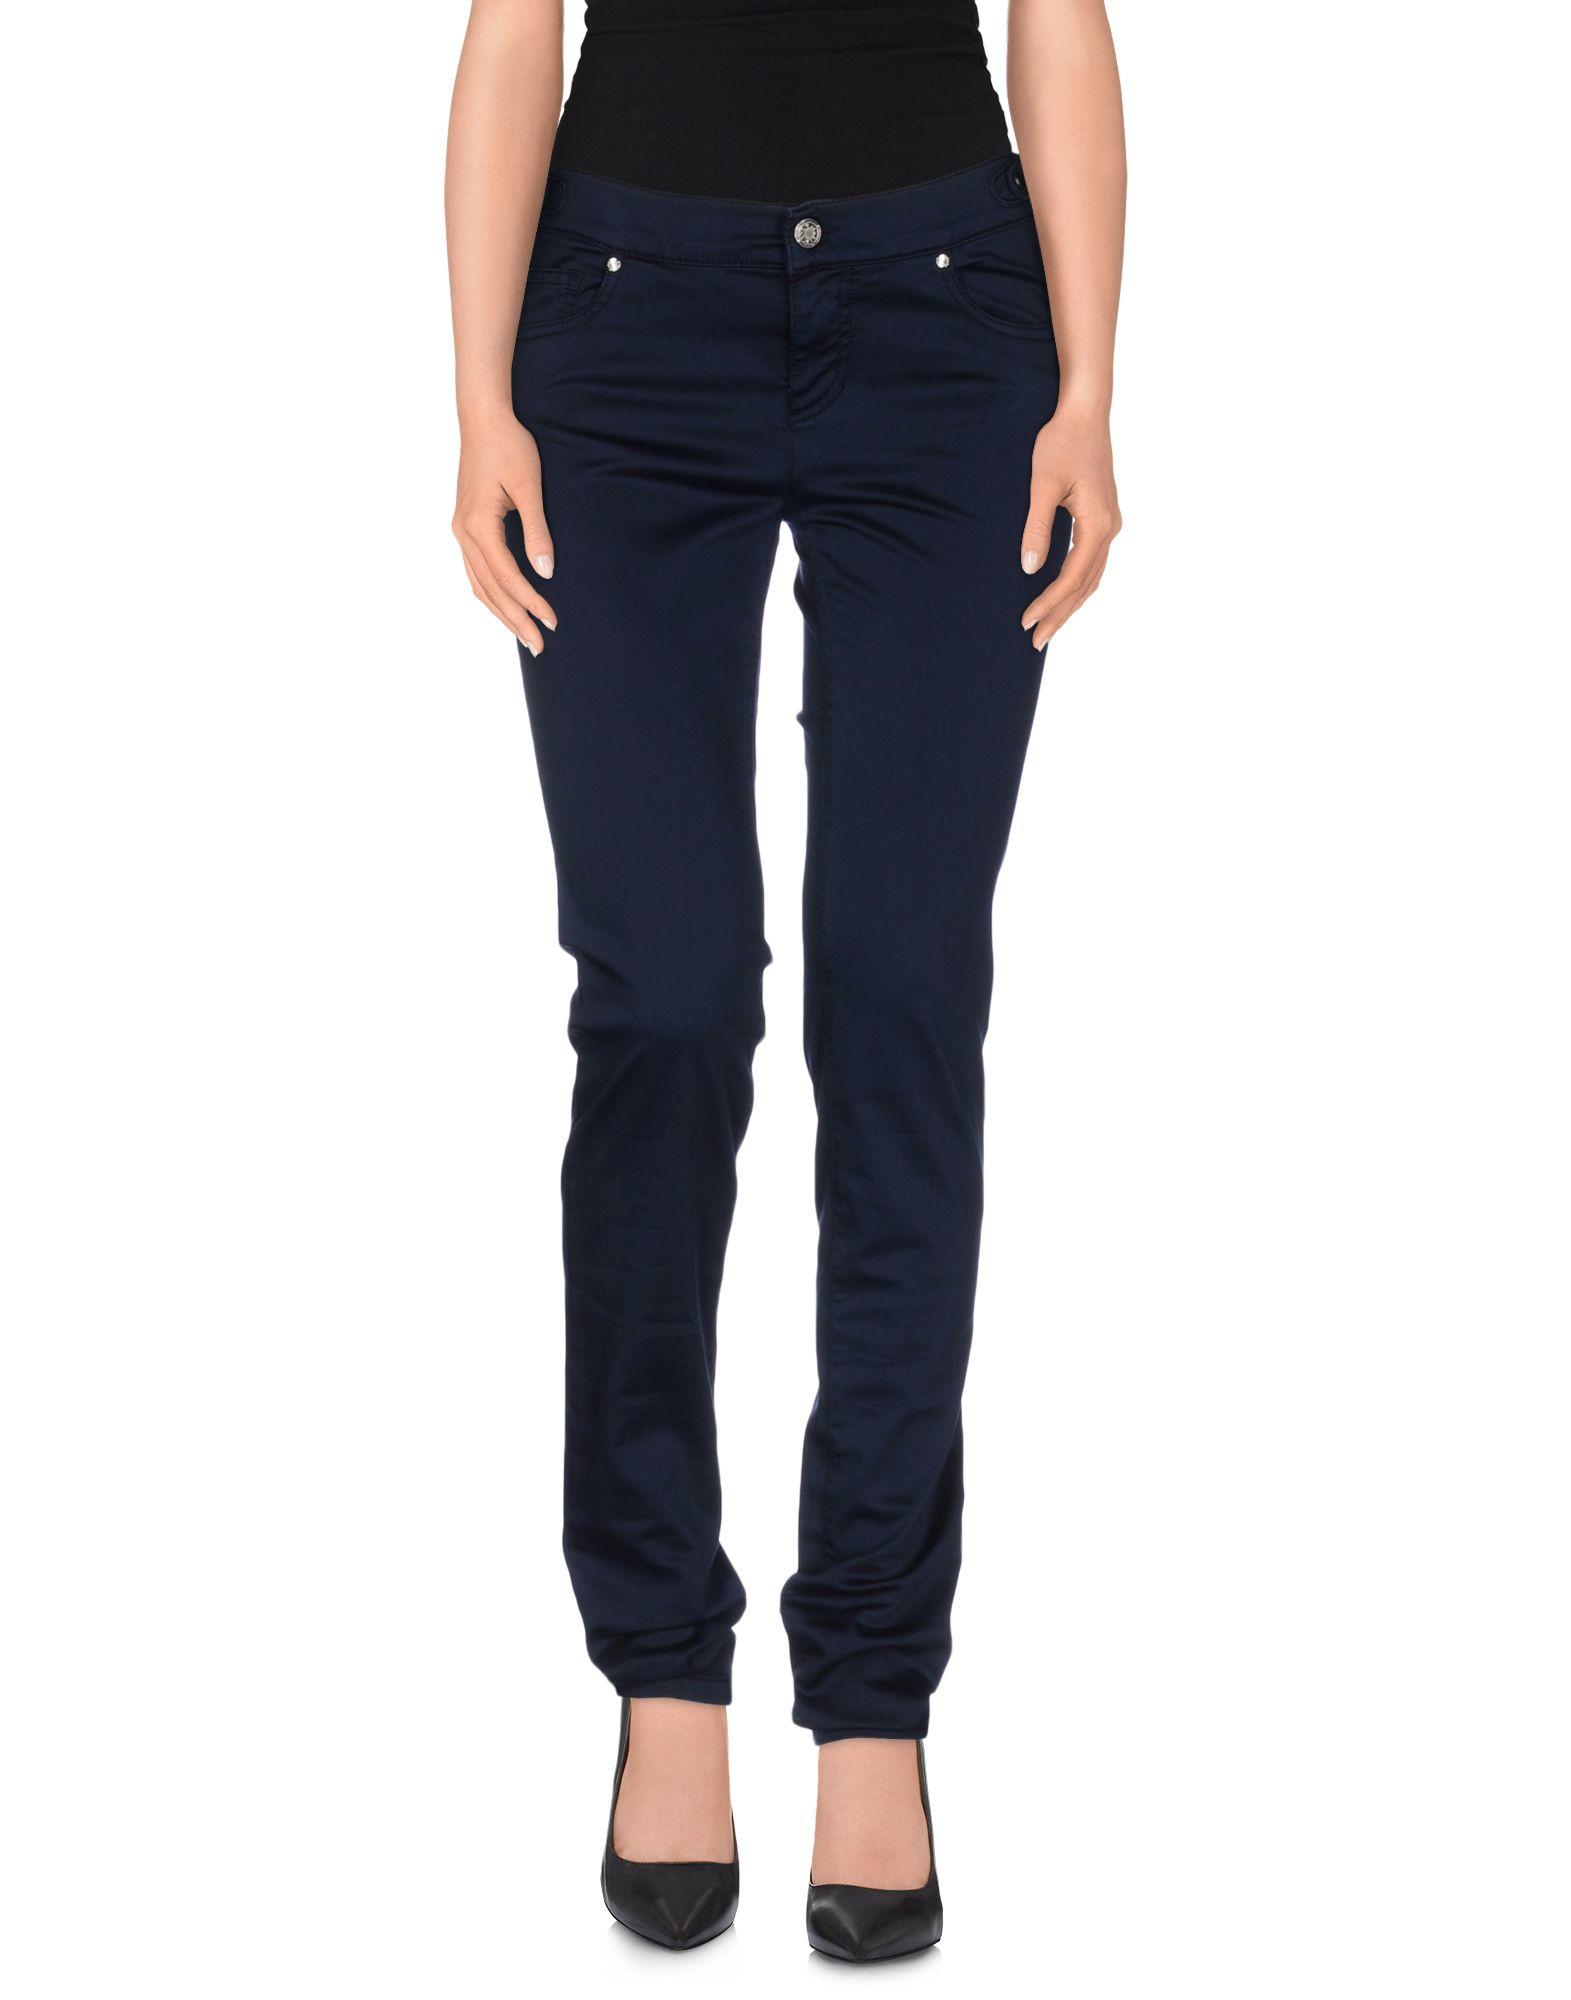 Elegant Versace Pants Amp Jeans For Women  US Online Store